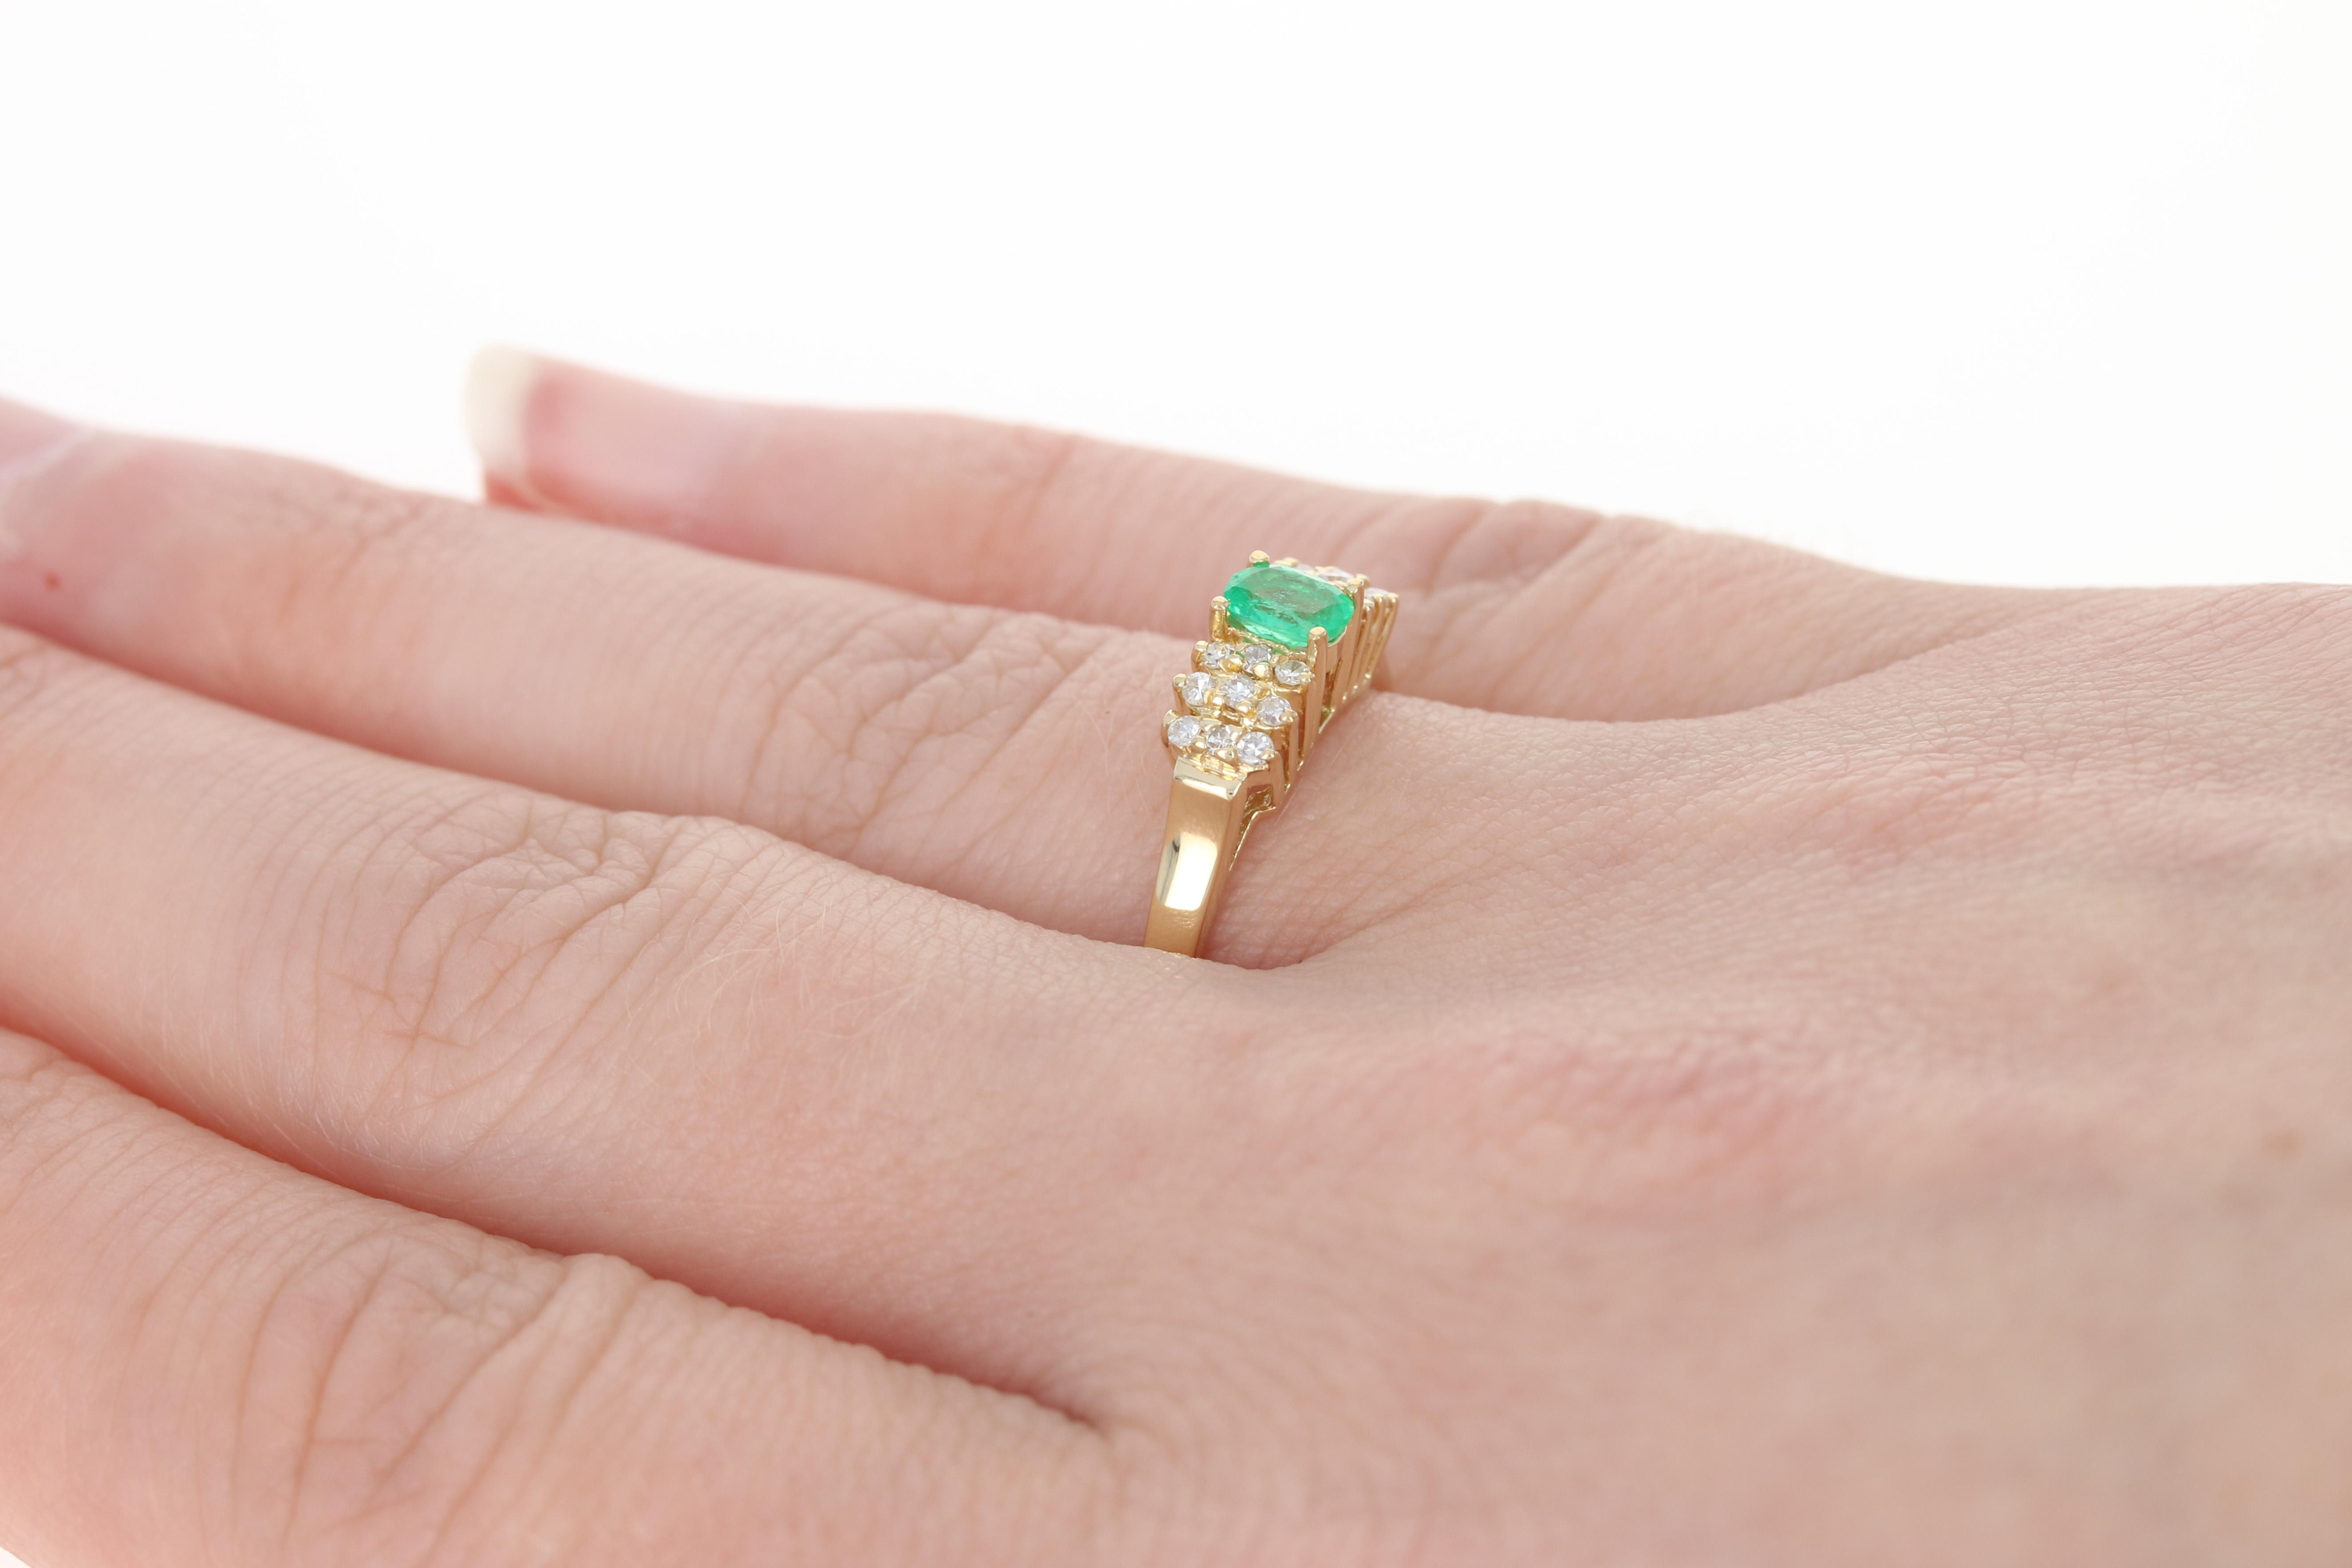 Emerald & Diamond Ring - 18k Yellow Gold Oval Brilliant .27ctw | eBay